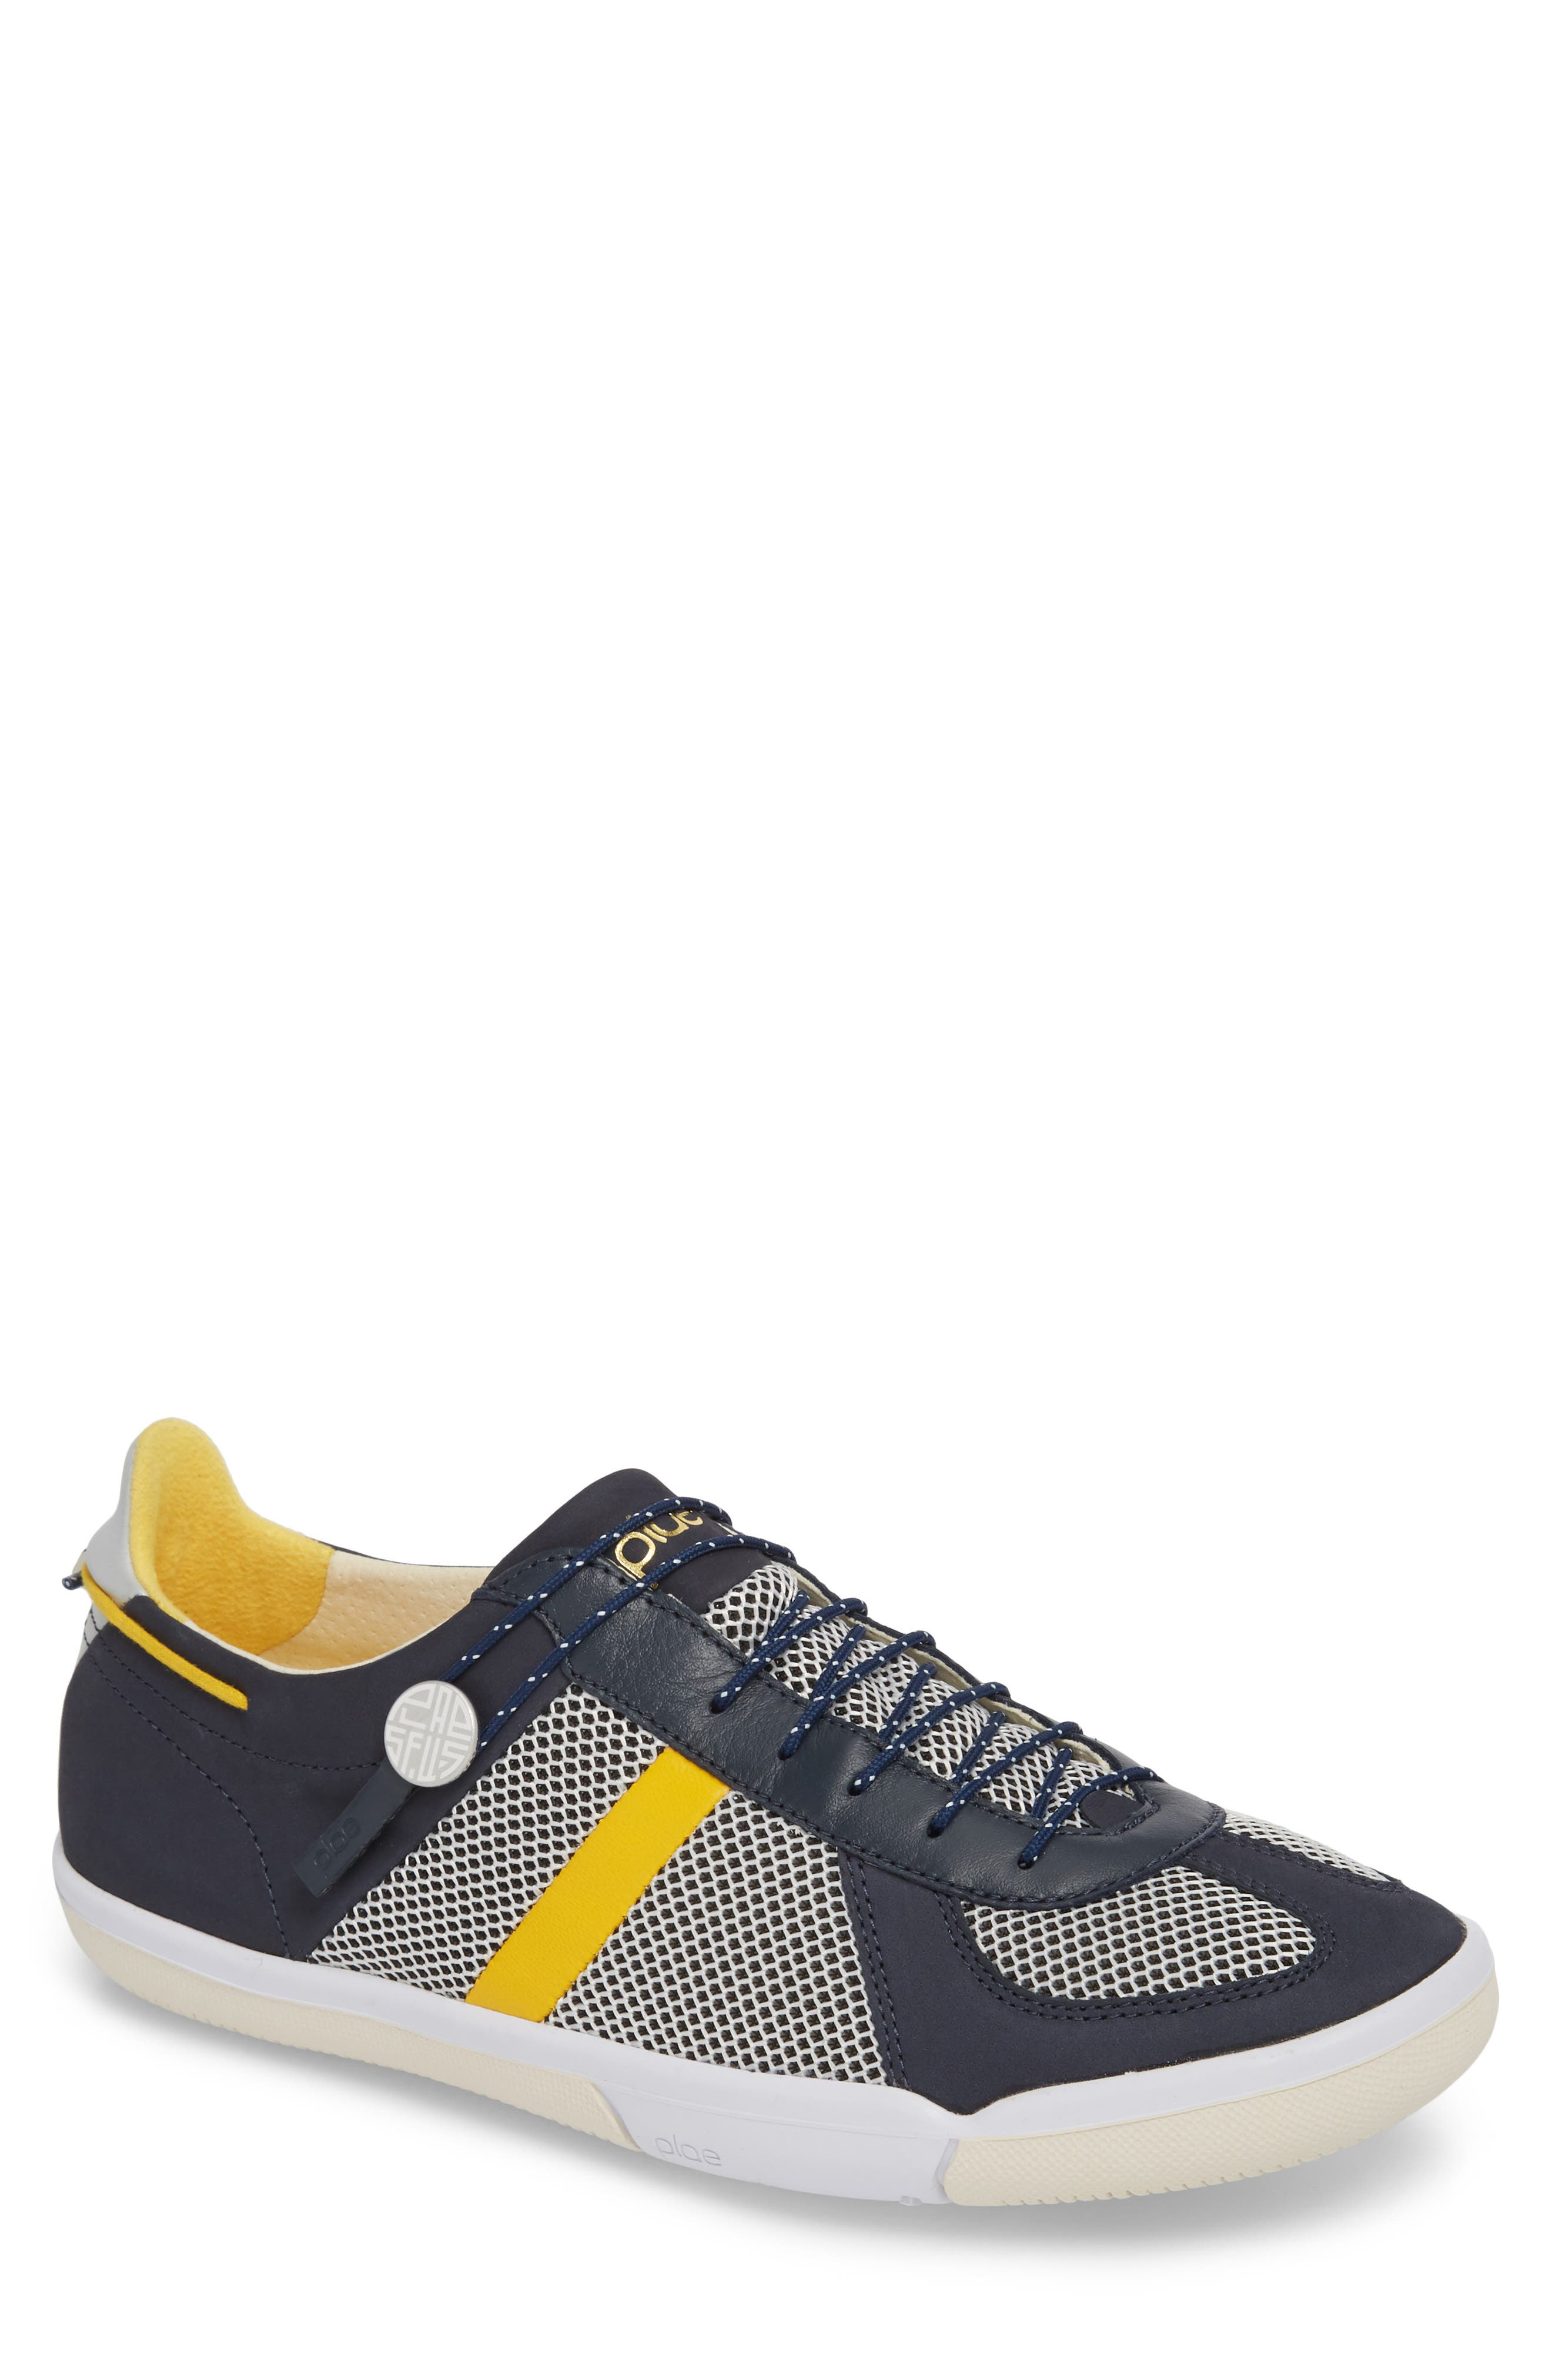 Alternate Image 1 Selected - PLAE Butler Low-Top Sneaker (Men)